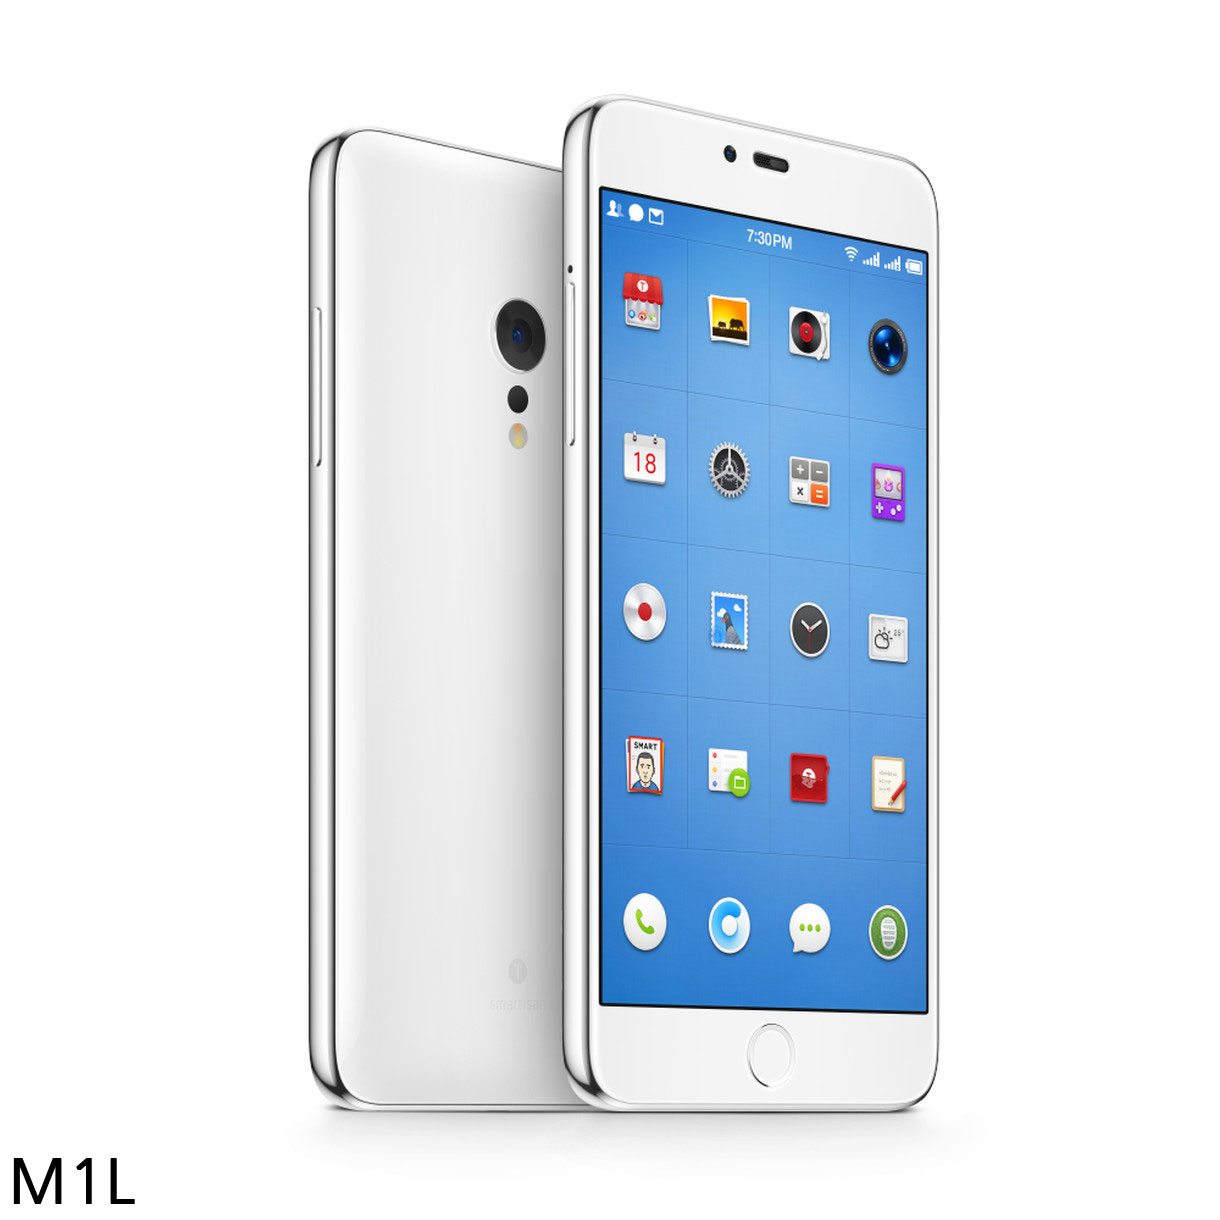 M1_M1L_13.jpg